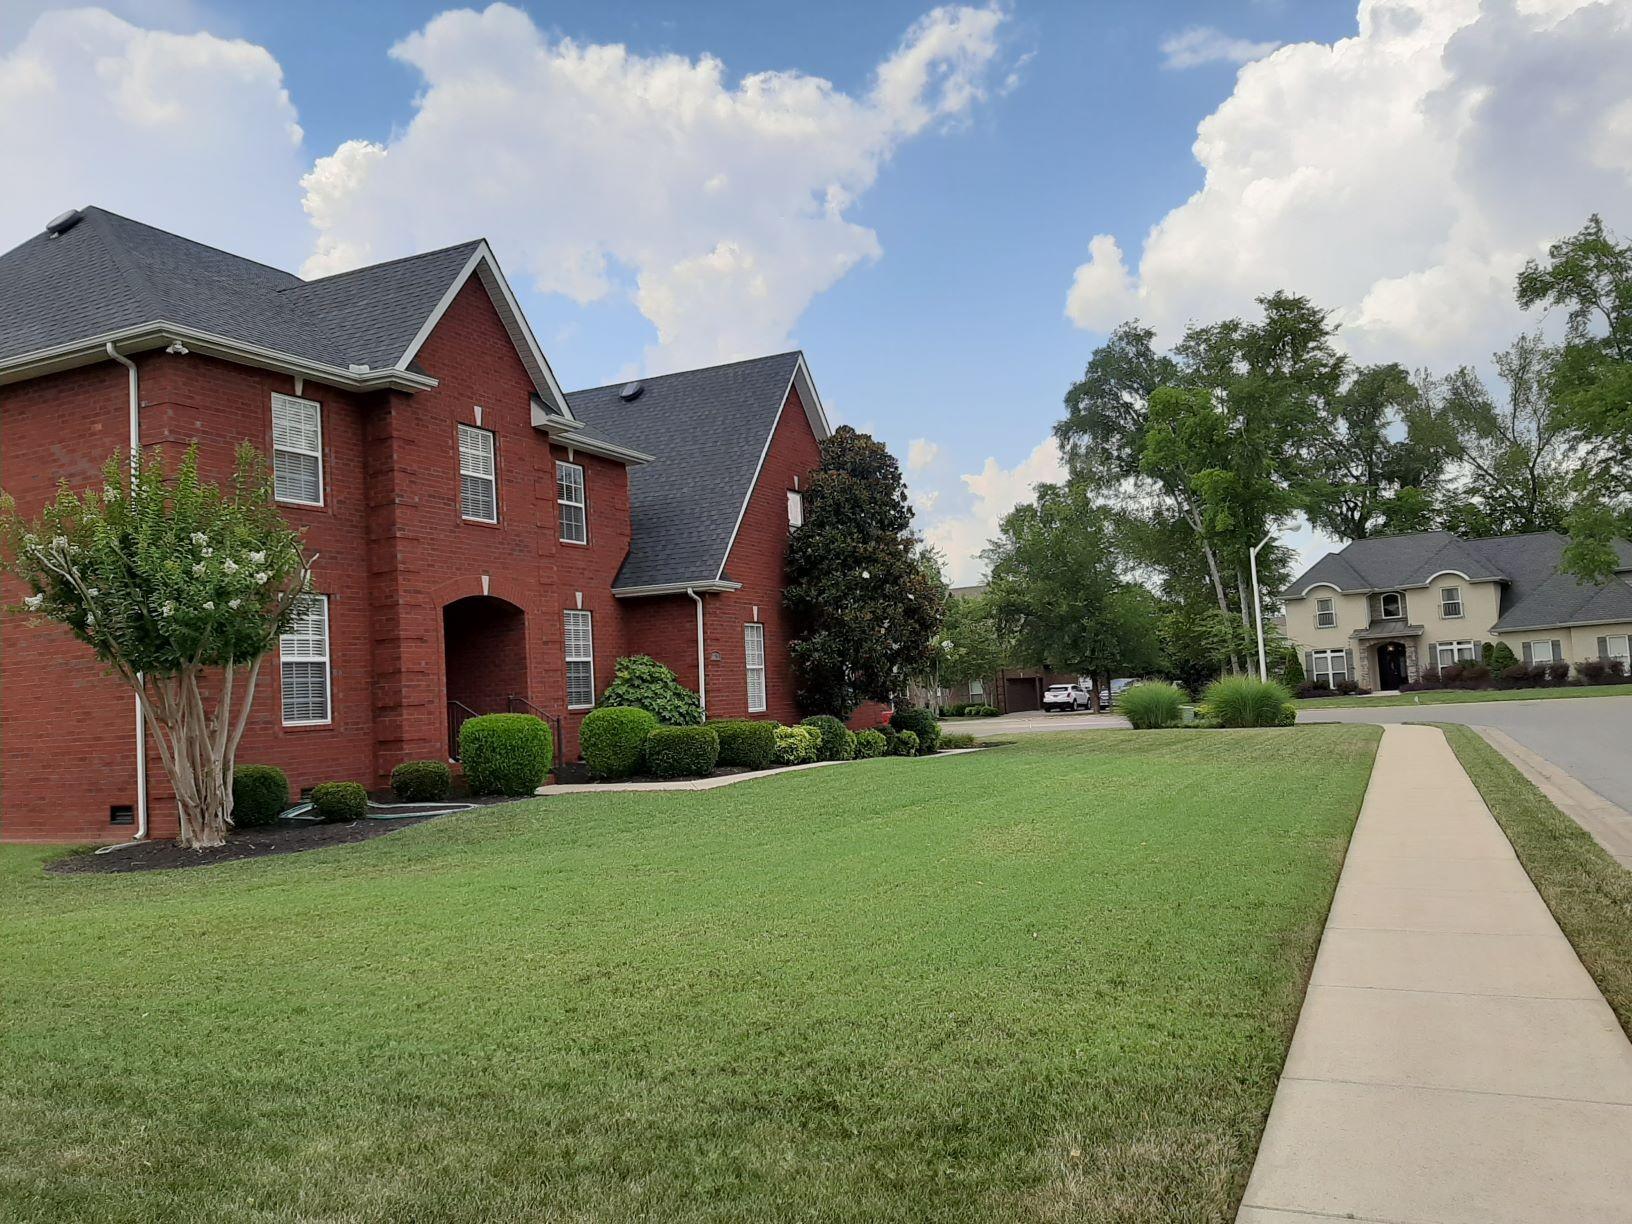 2210 Kadyday Way, Murfreesboro, TN 37128 - Murfreesboro, TN real estate listing